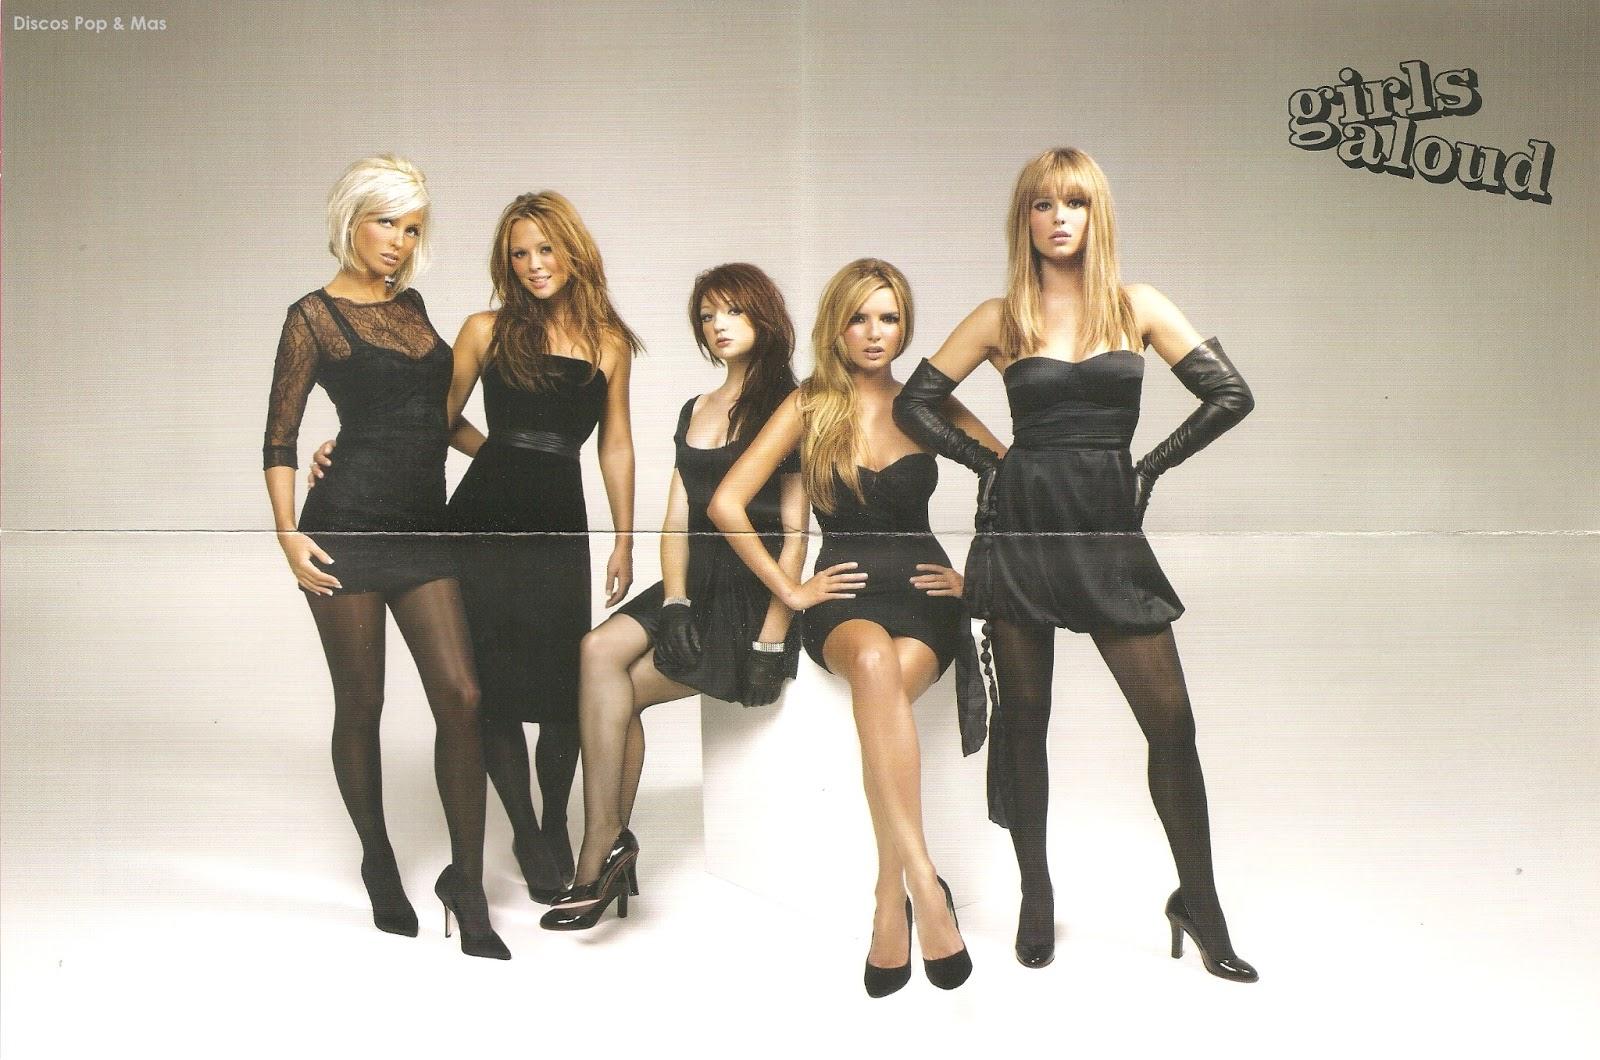 discos pop 2006: